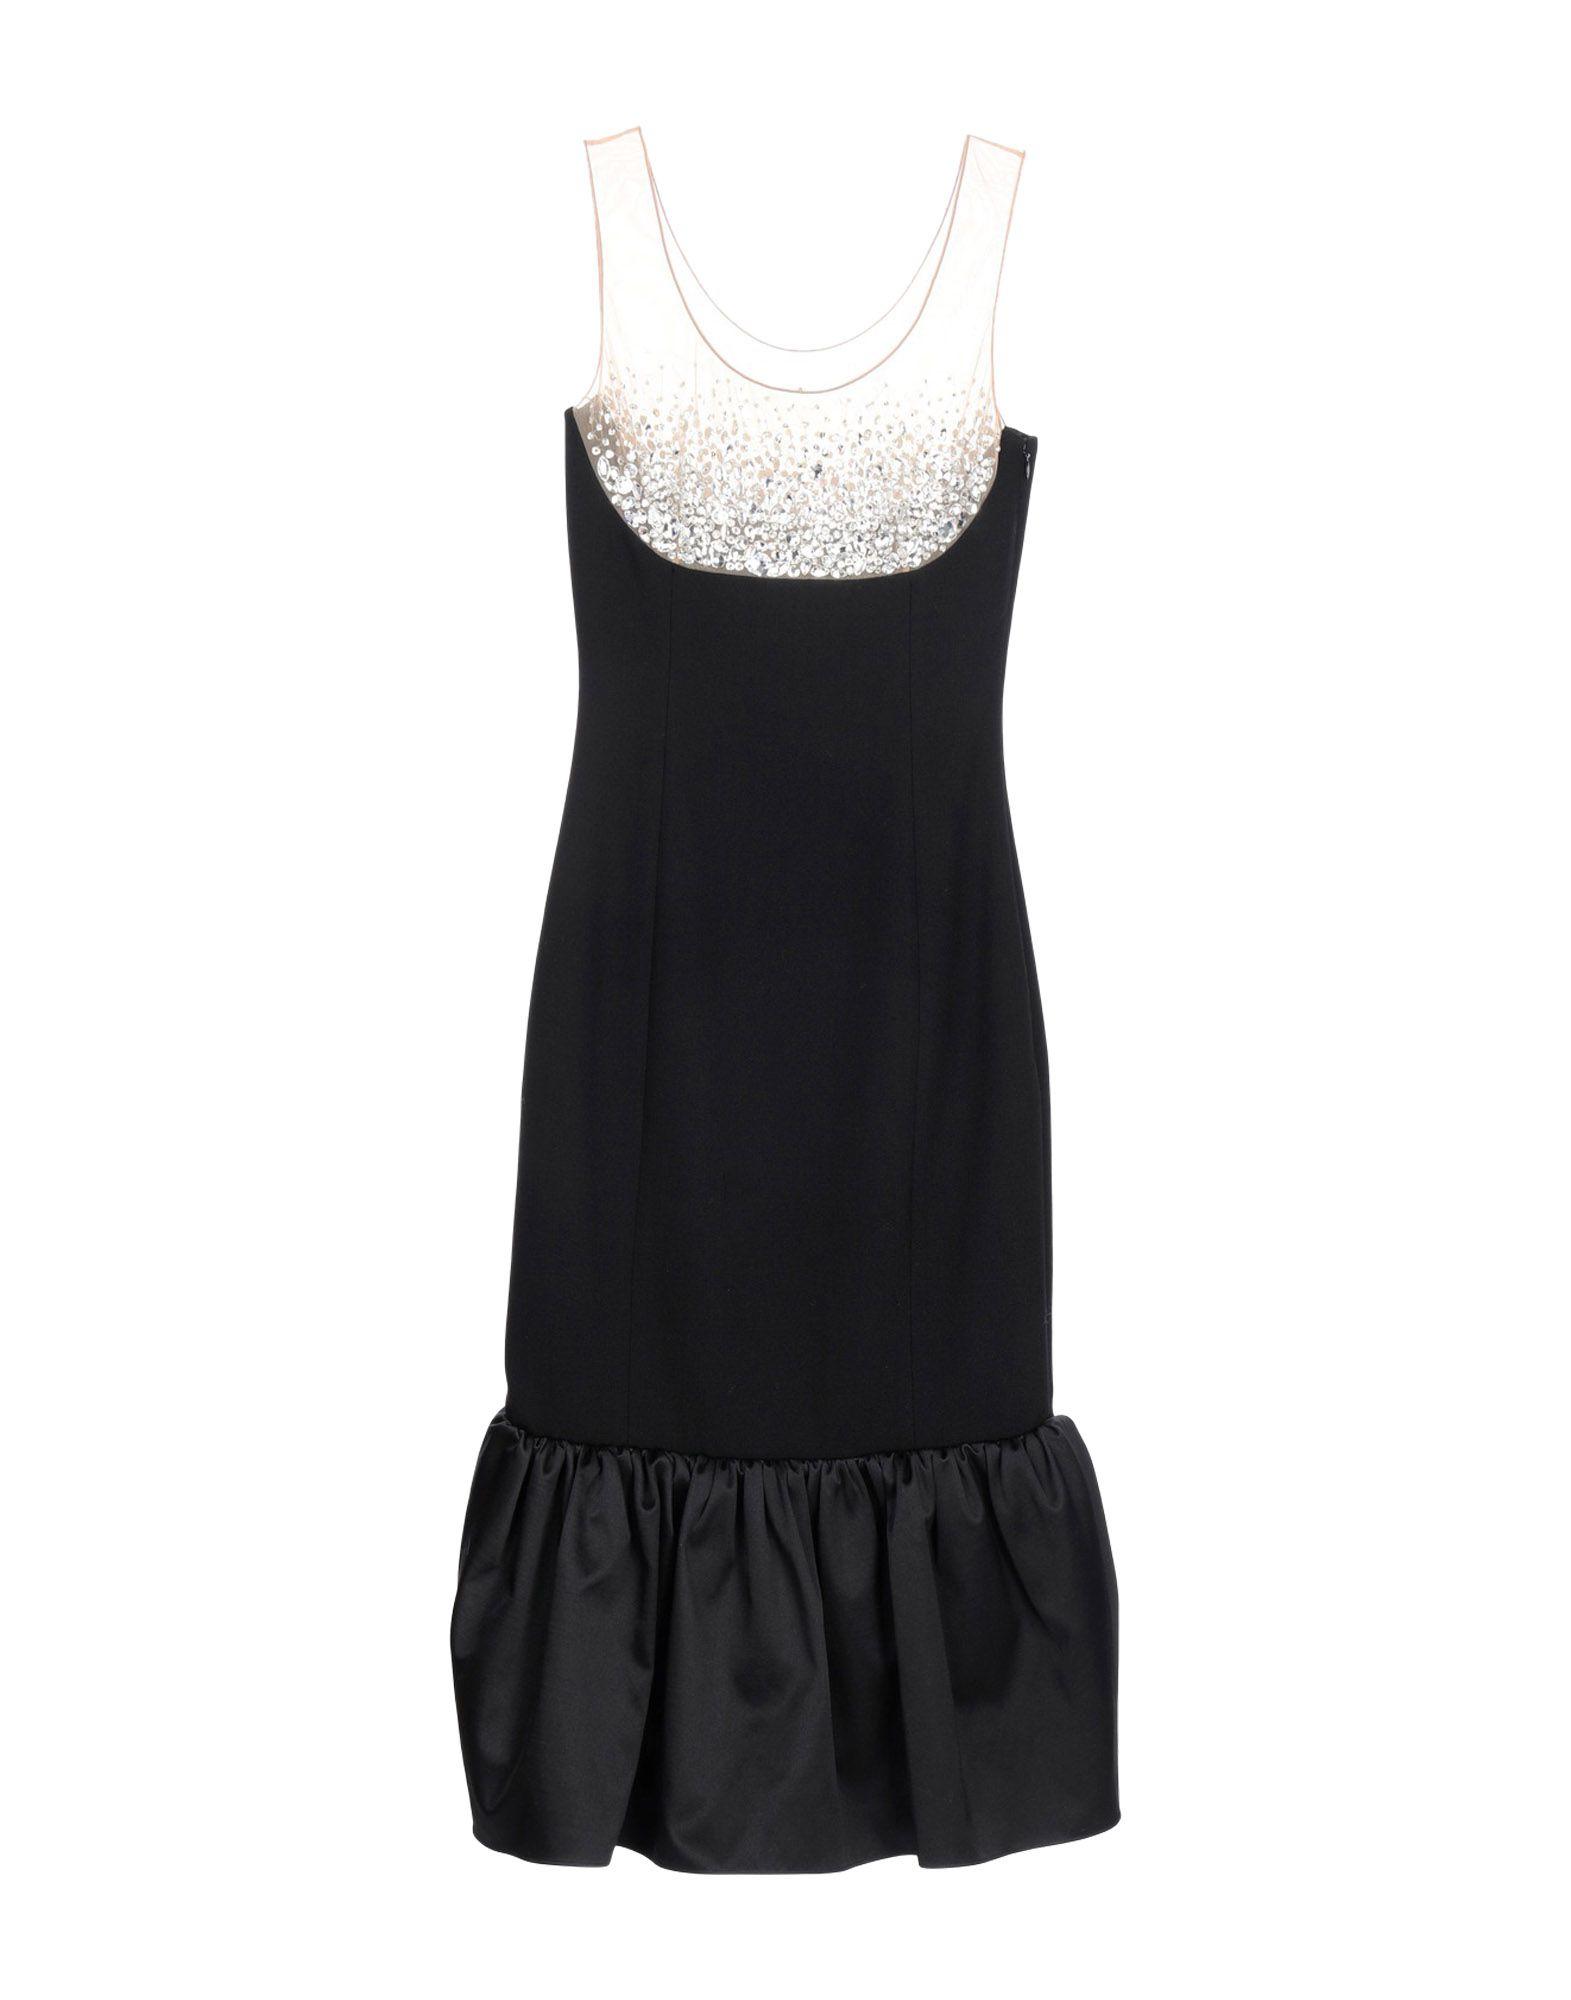 MICHAEL KORS COLLECTION Платье длиной 3/4 michael kors collection платье длиной 3 4